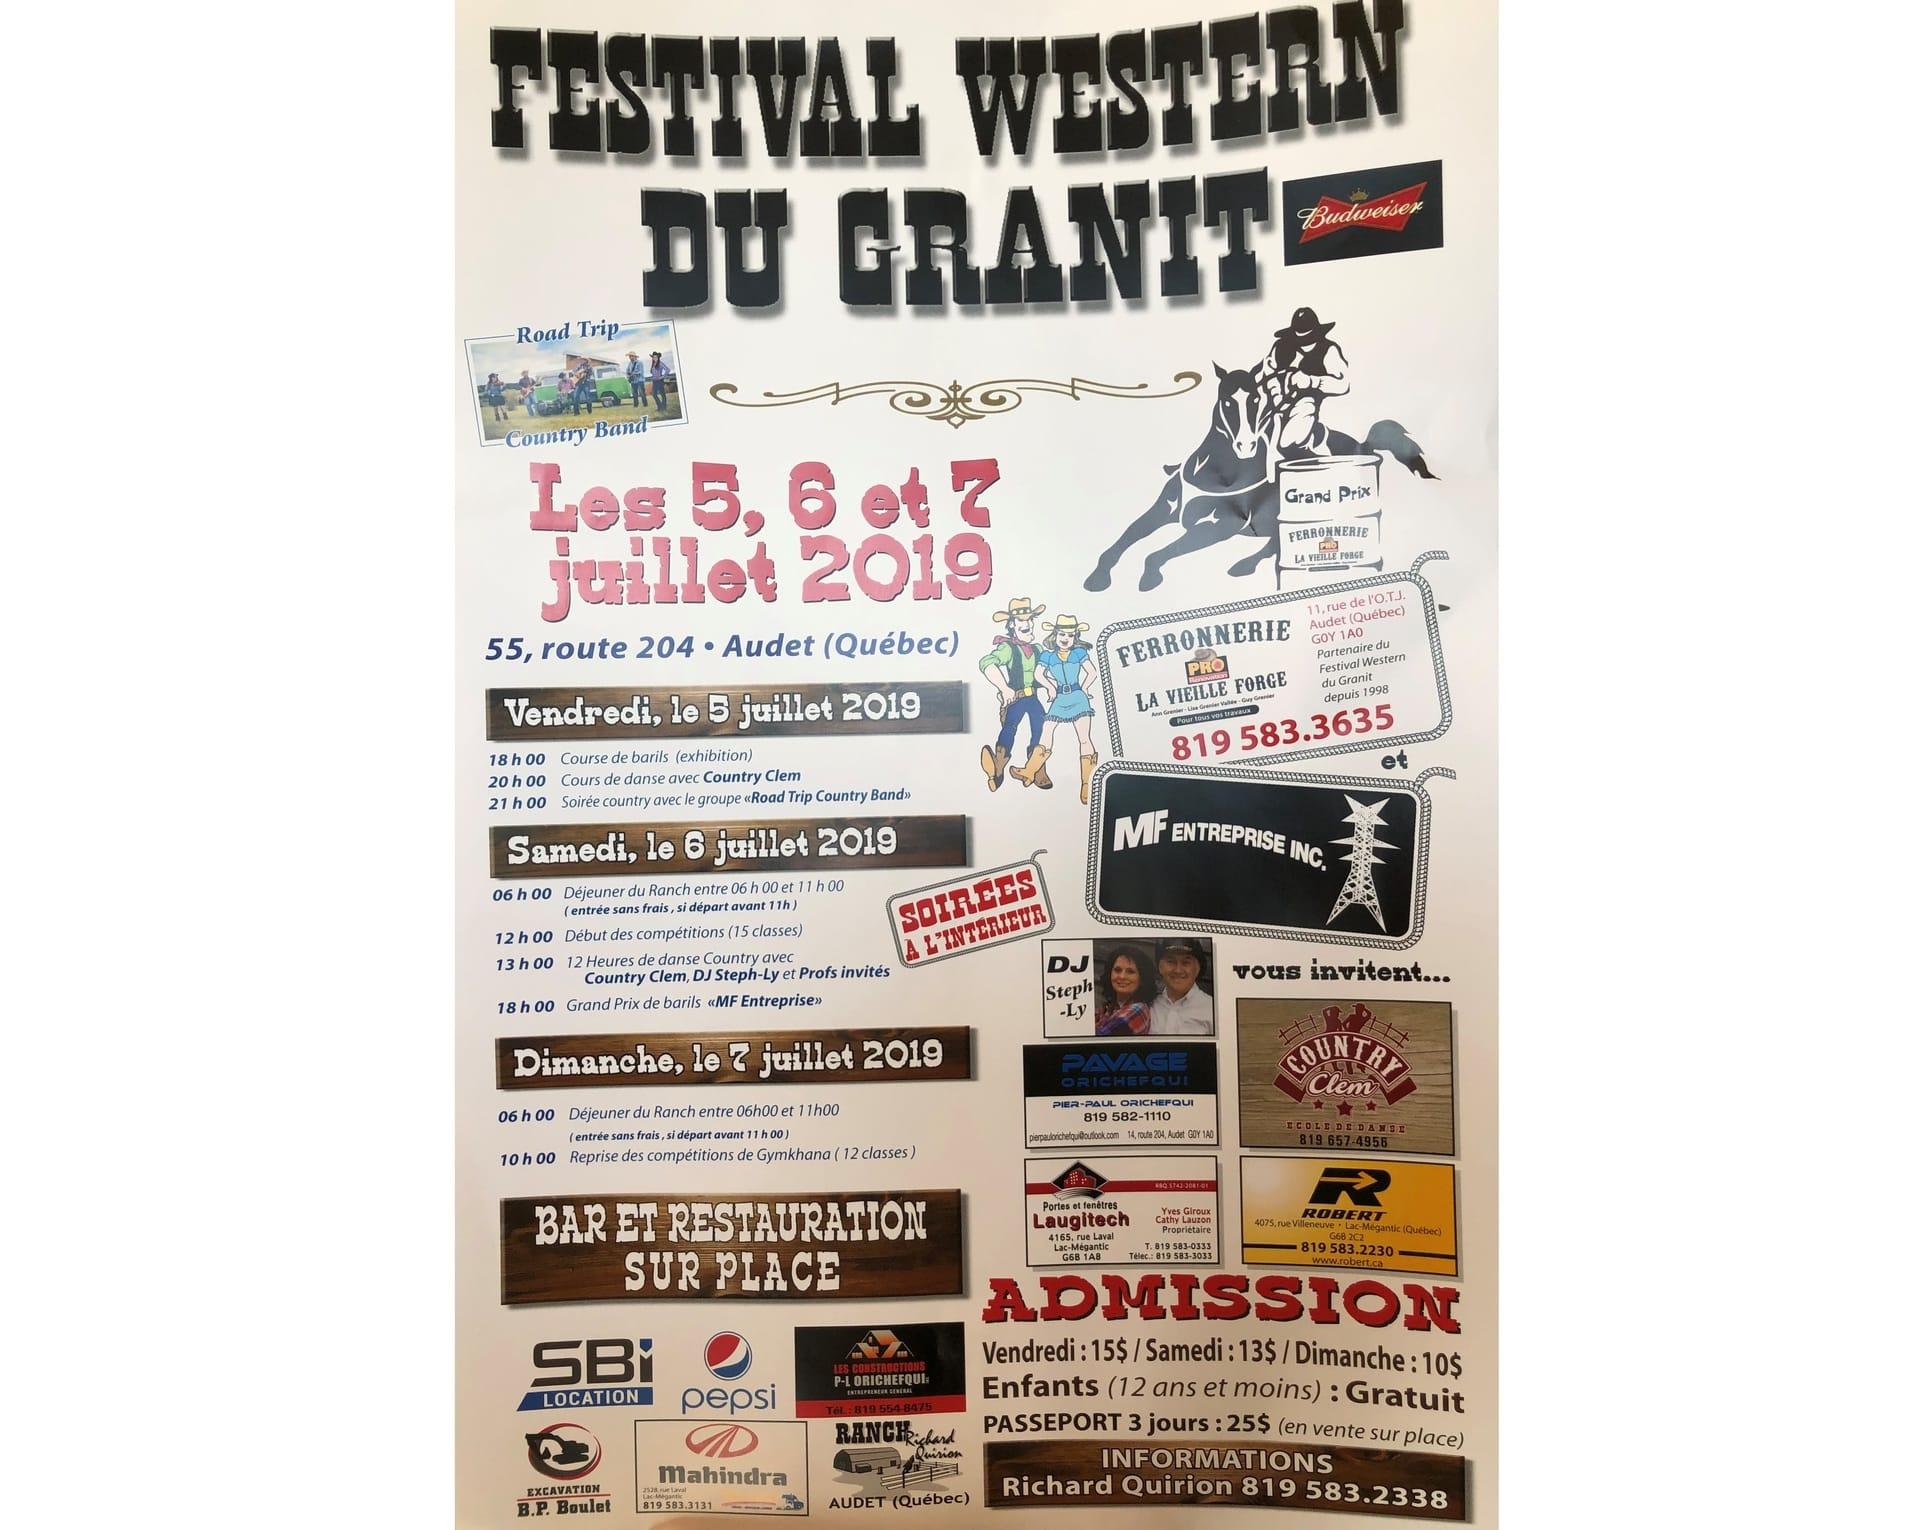 Festival Western du Granit, dates à confirmer